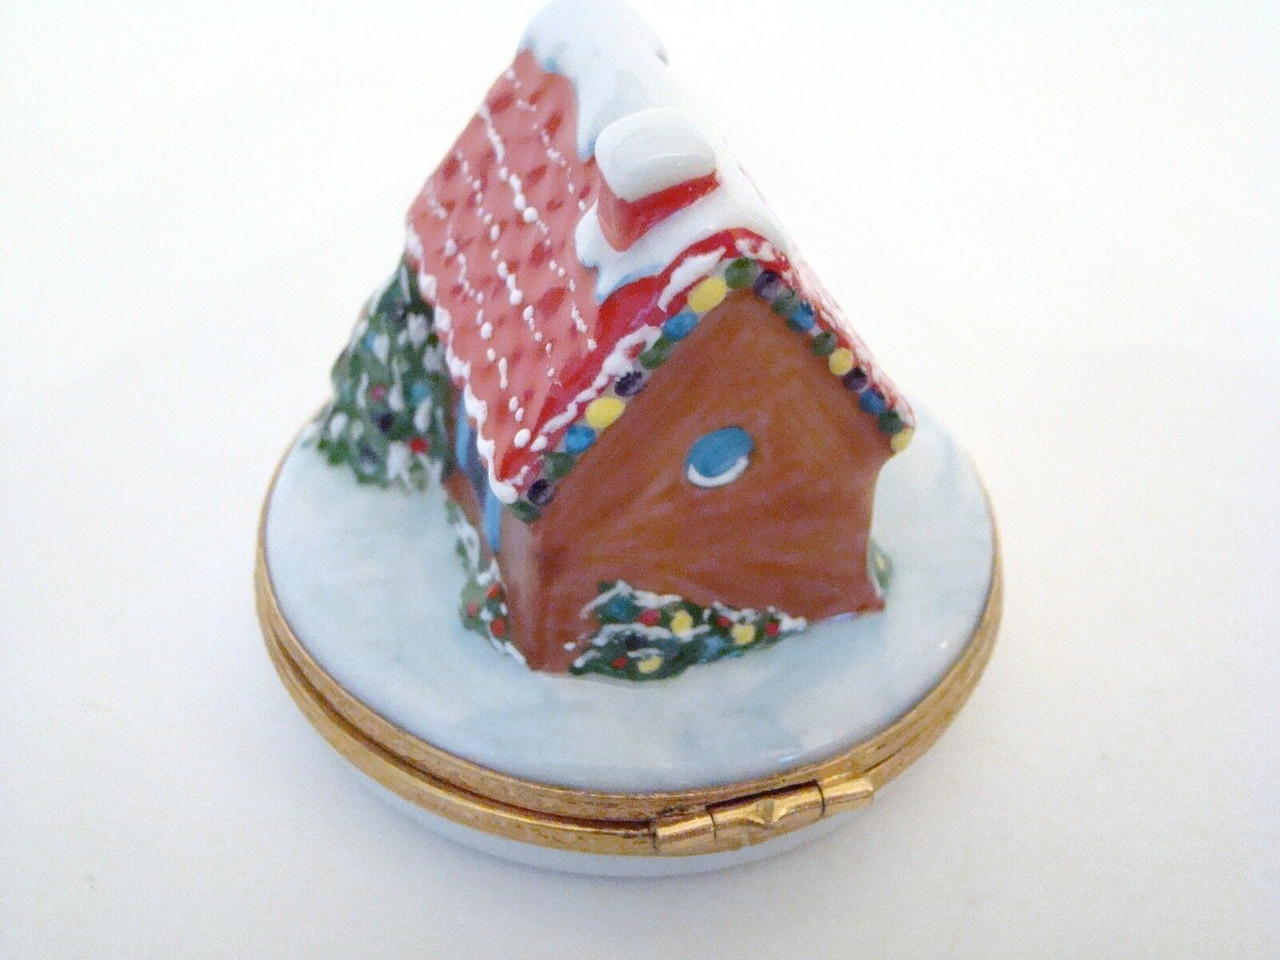 Artoria Limoges Holiday House Cottage Limoges Box (Artoria7384)